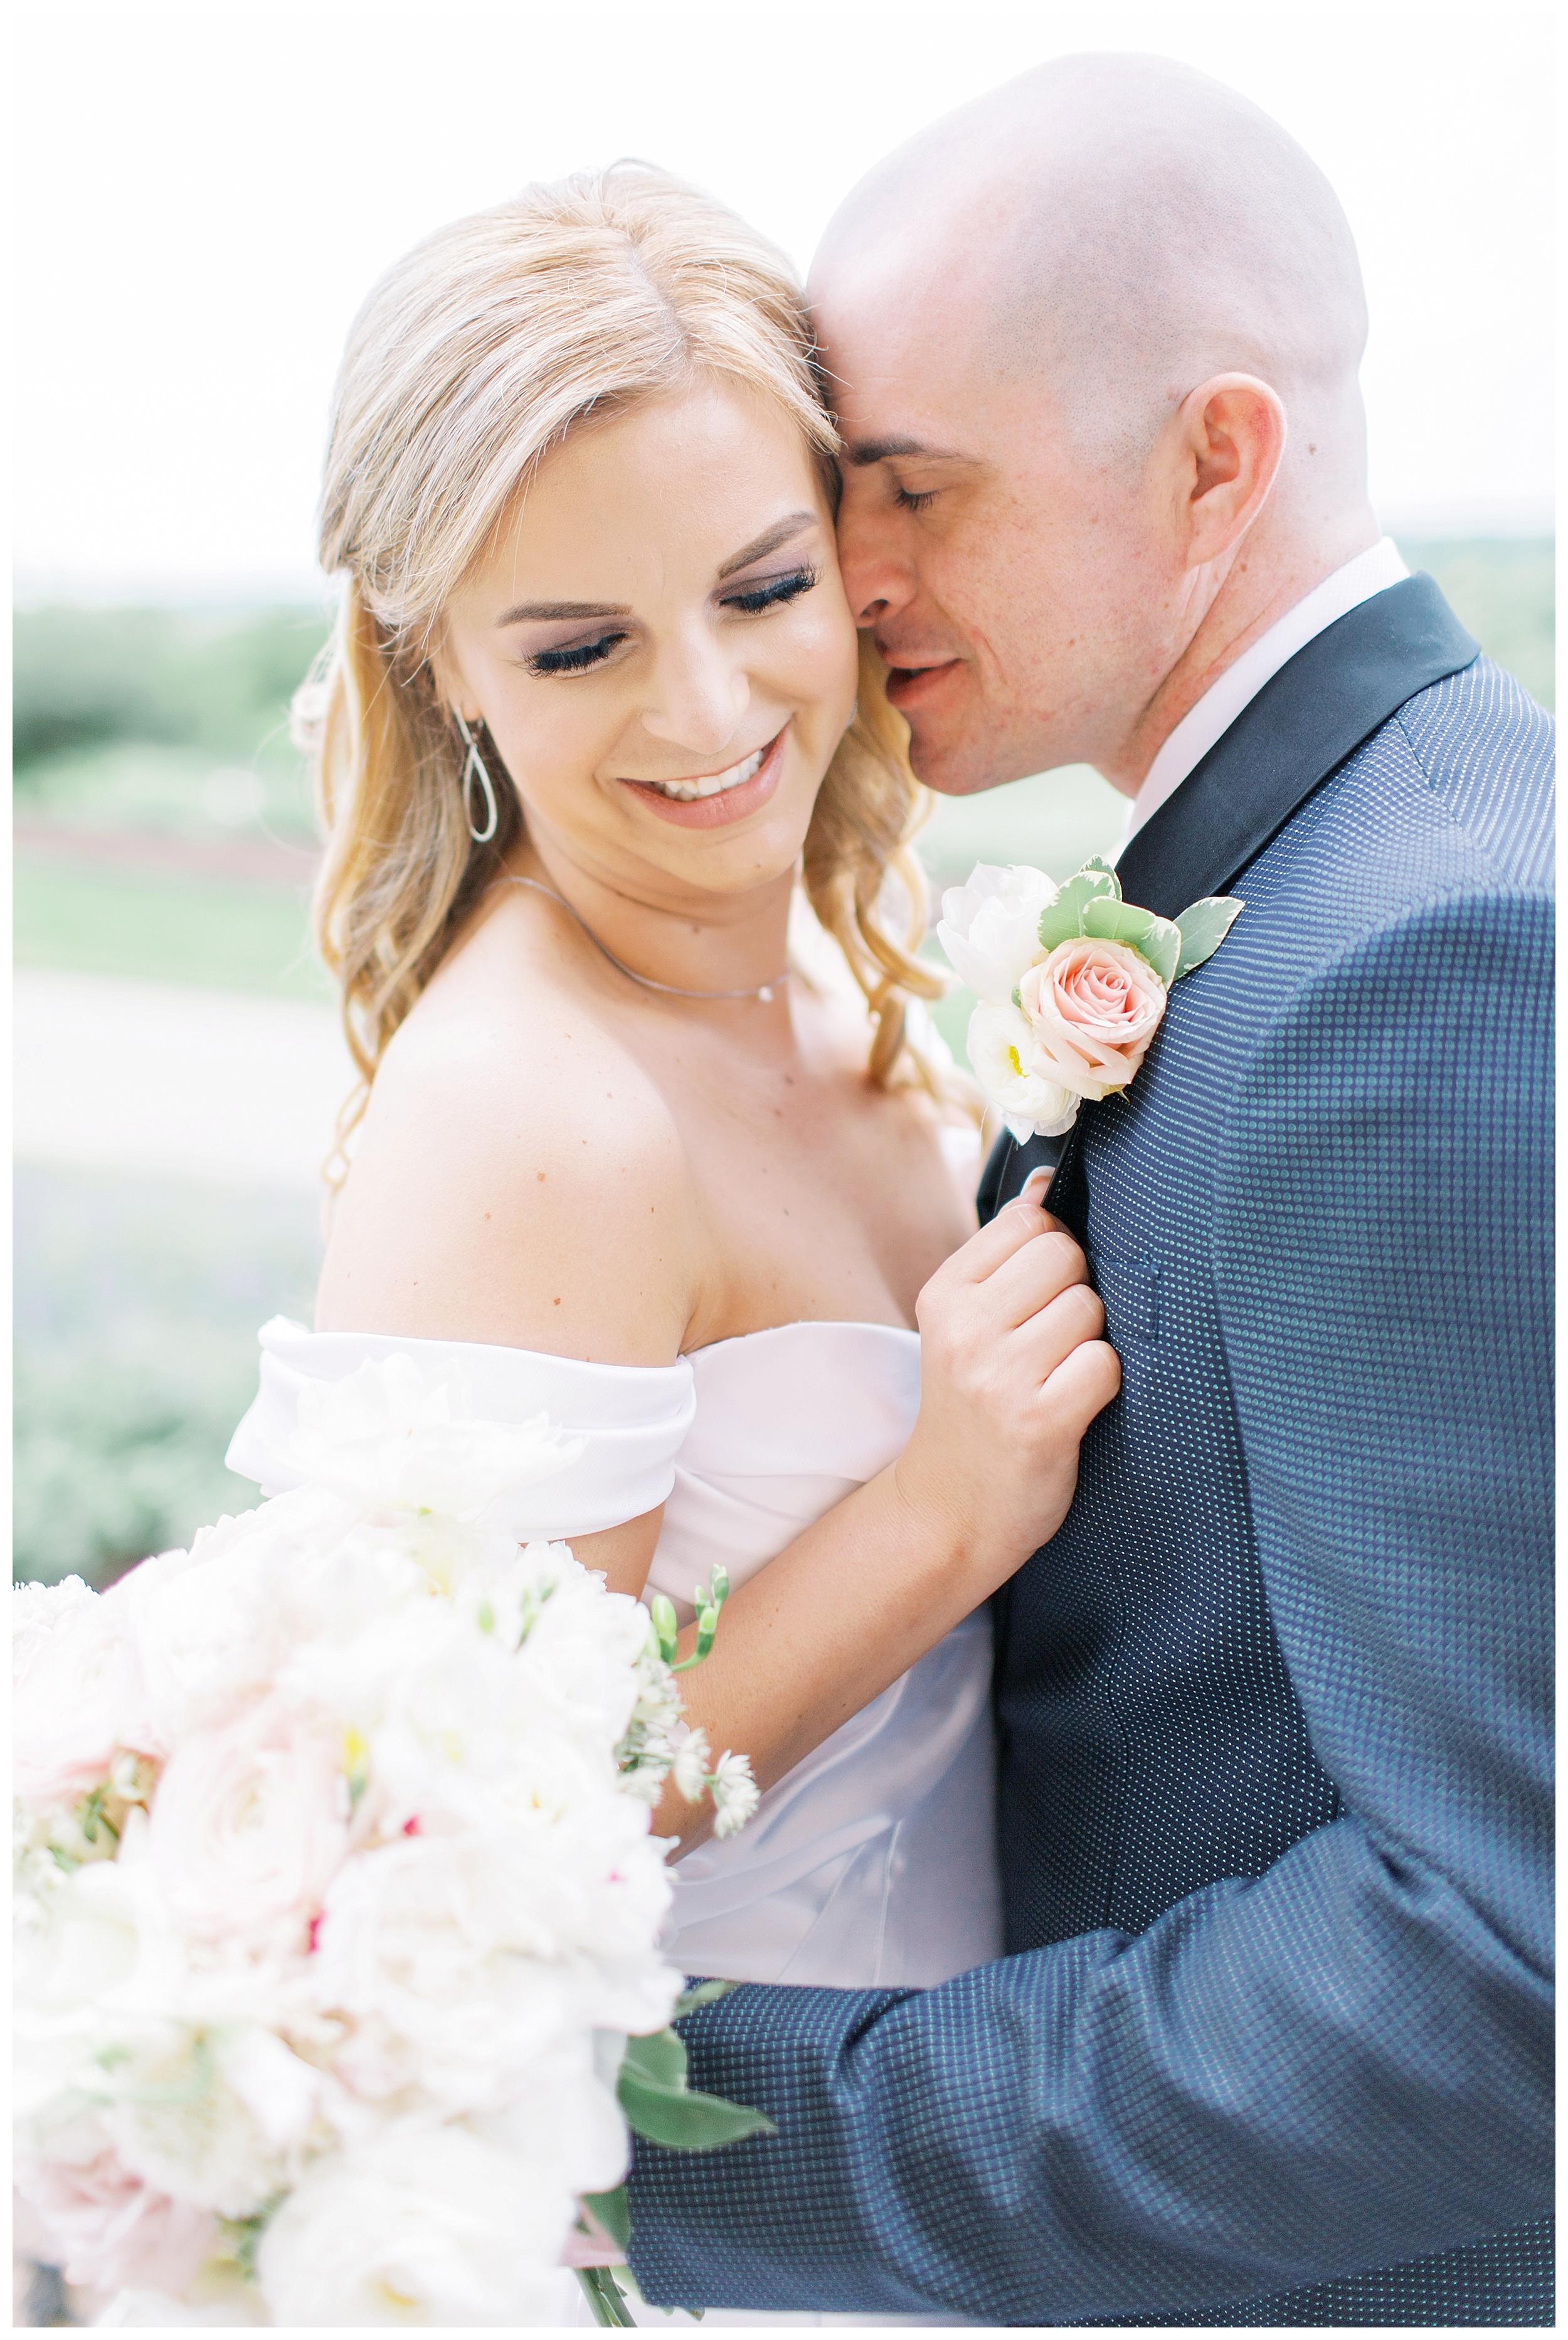 Lansdowne Resort Wedding | Virginia Film Wedding Photographer Kir Tuben_0037.jpg